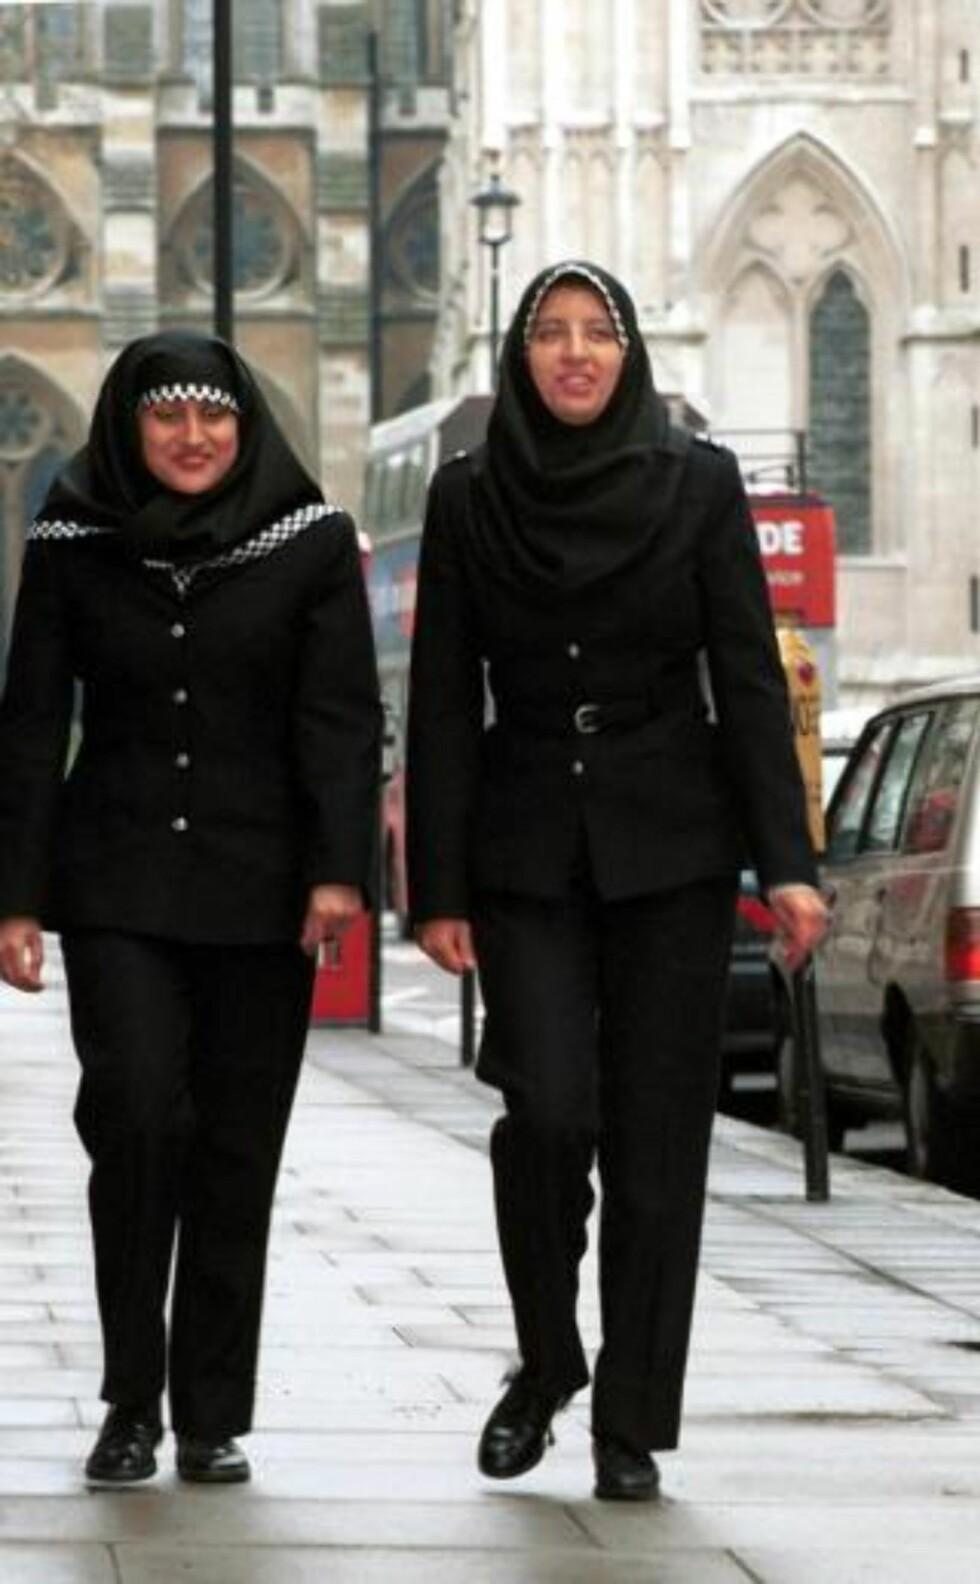 TILLATT I ENGLAND: To kvinnelige betjenter i London-politiet, som bruker hijab som del av uniformen. Foto: SCANPIX/EPA PHOTO AFP/METROPOLITAN POLICE